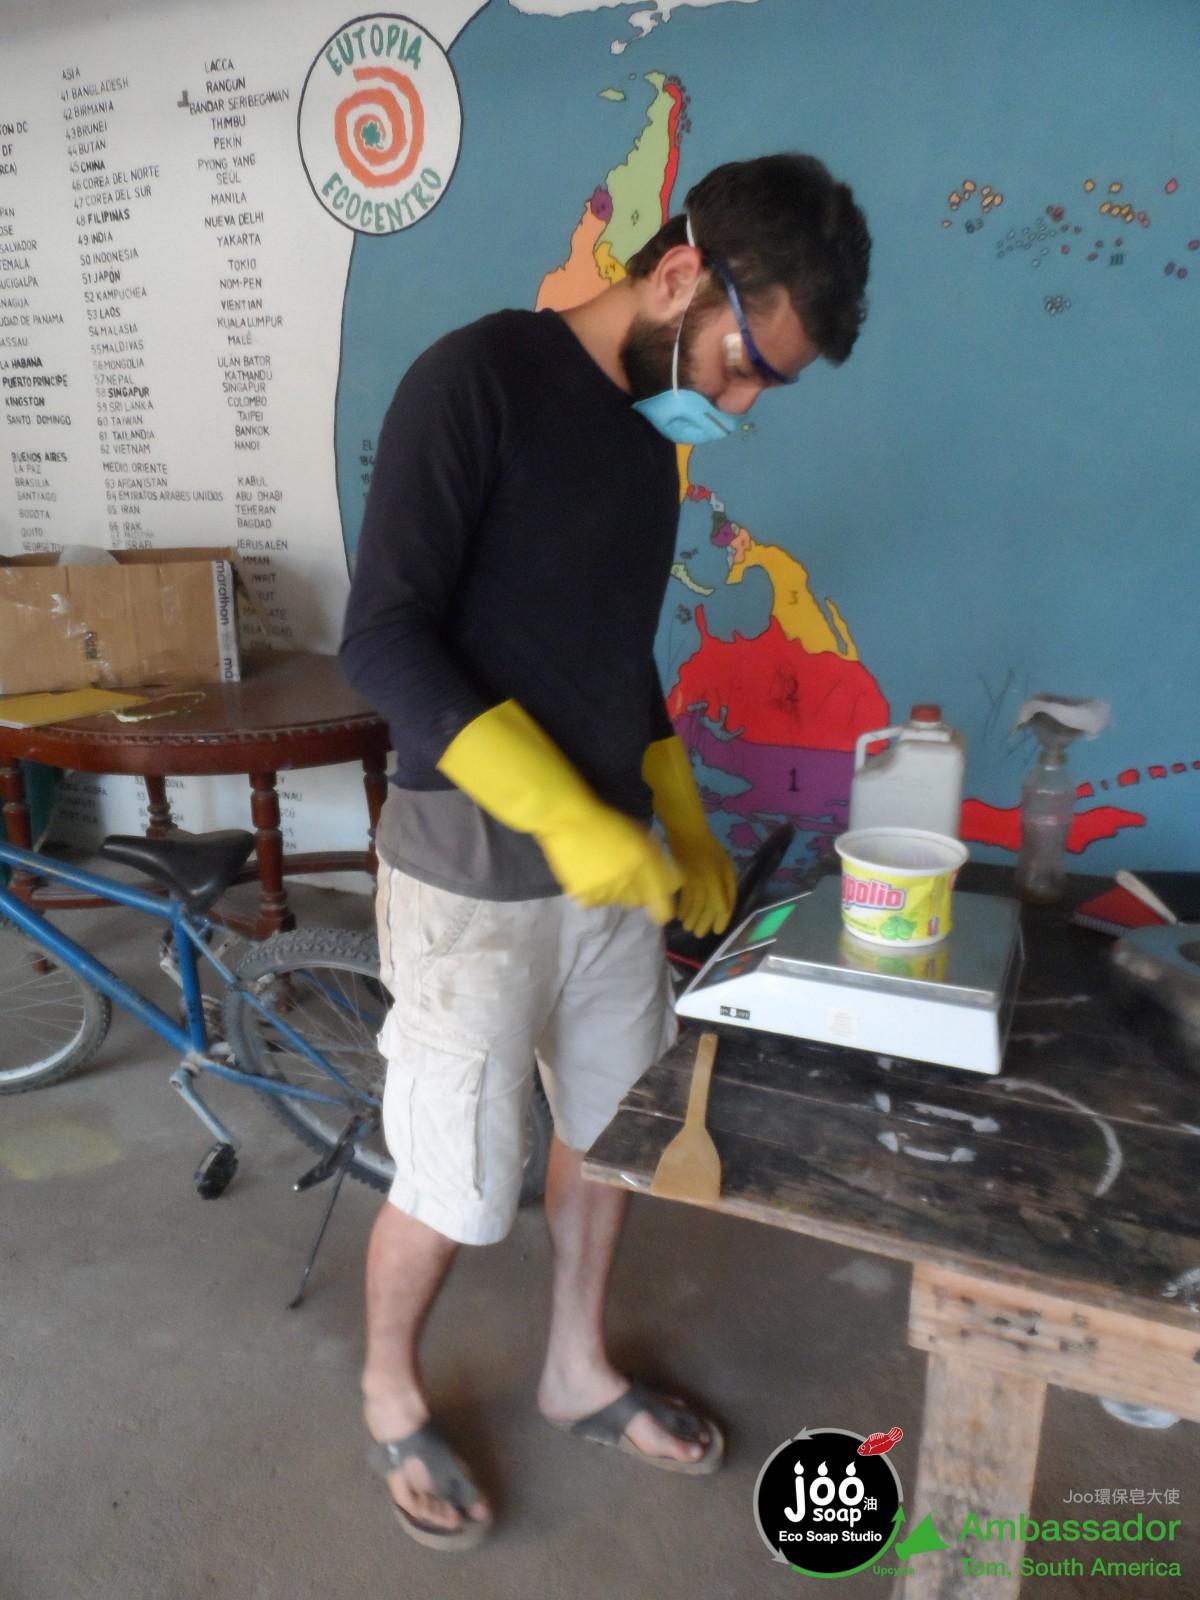 JooSoap Ambassador Tom Eutopia Workshop